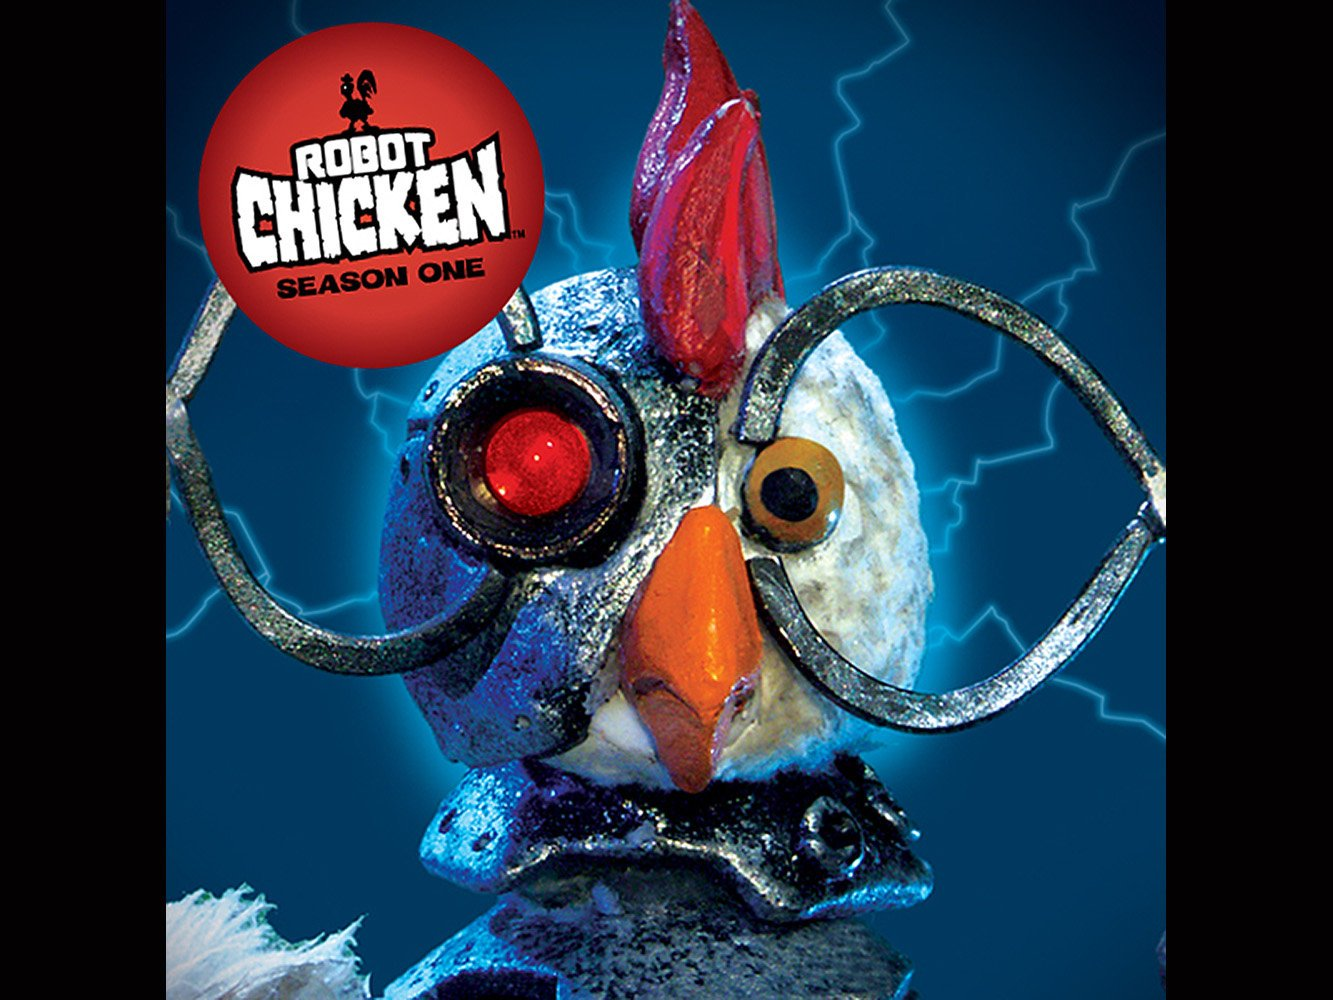 Amazoncom Robot Chicken Season 1 Amazon Digital Services Llc